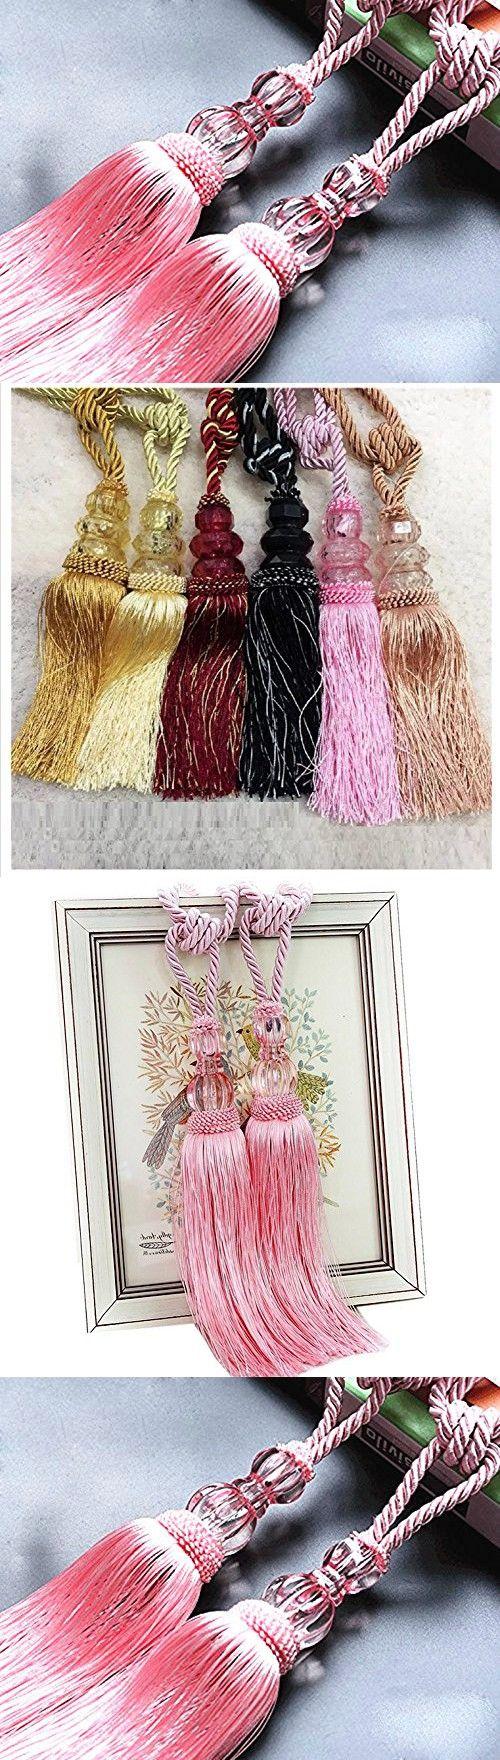 HG-X @ 1 Pair Crystal Beads Drapery Curtain Holdbacks Tassel Curtain Rope Tie Band Home Decor (Pink)